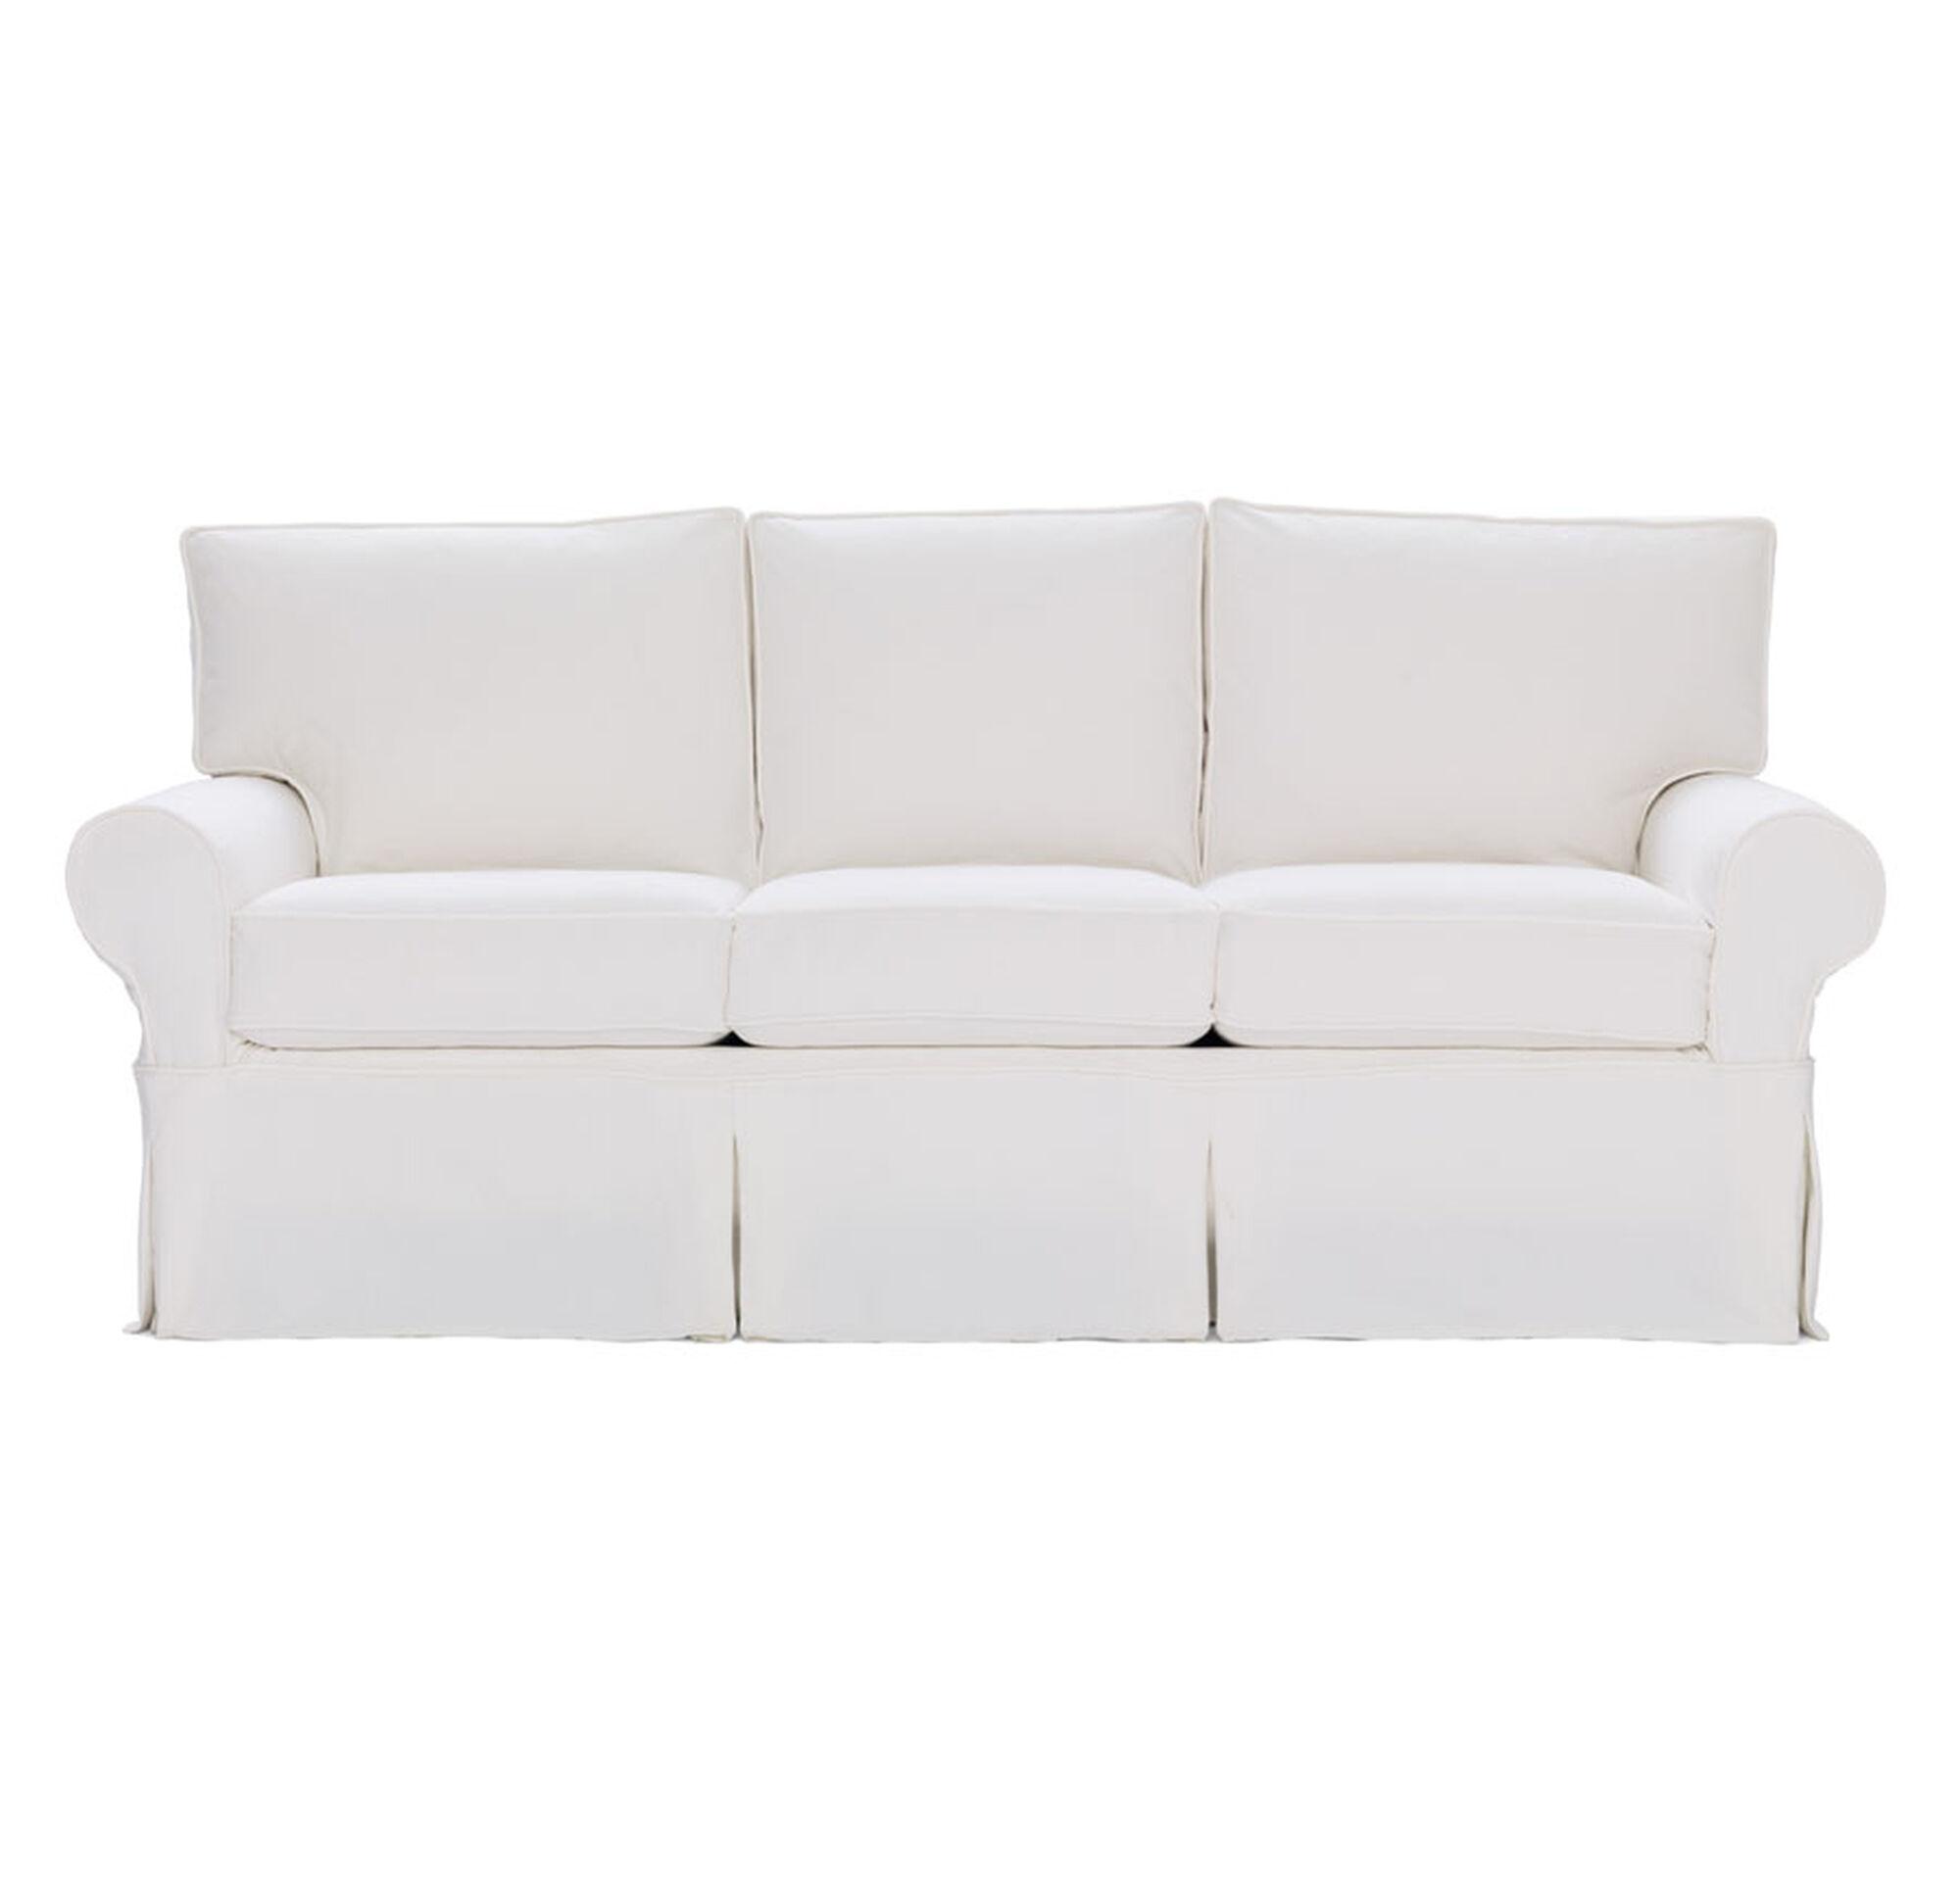 slipcovered sleeper sofas ealing slipcover sleeper sofa ambroseupholstery thesofa. Black Bedroom Furniture Sets. Home Design Ideas